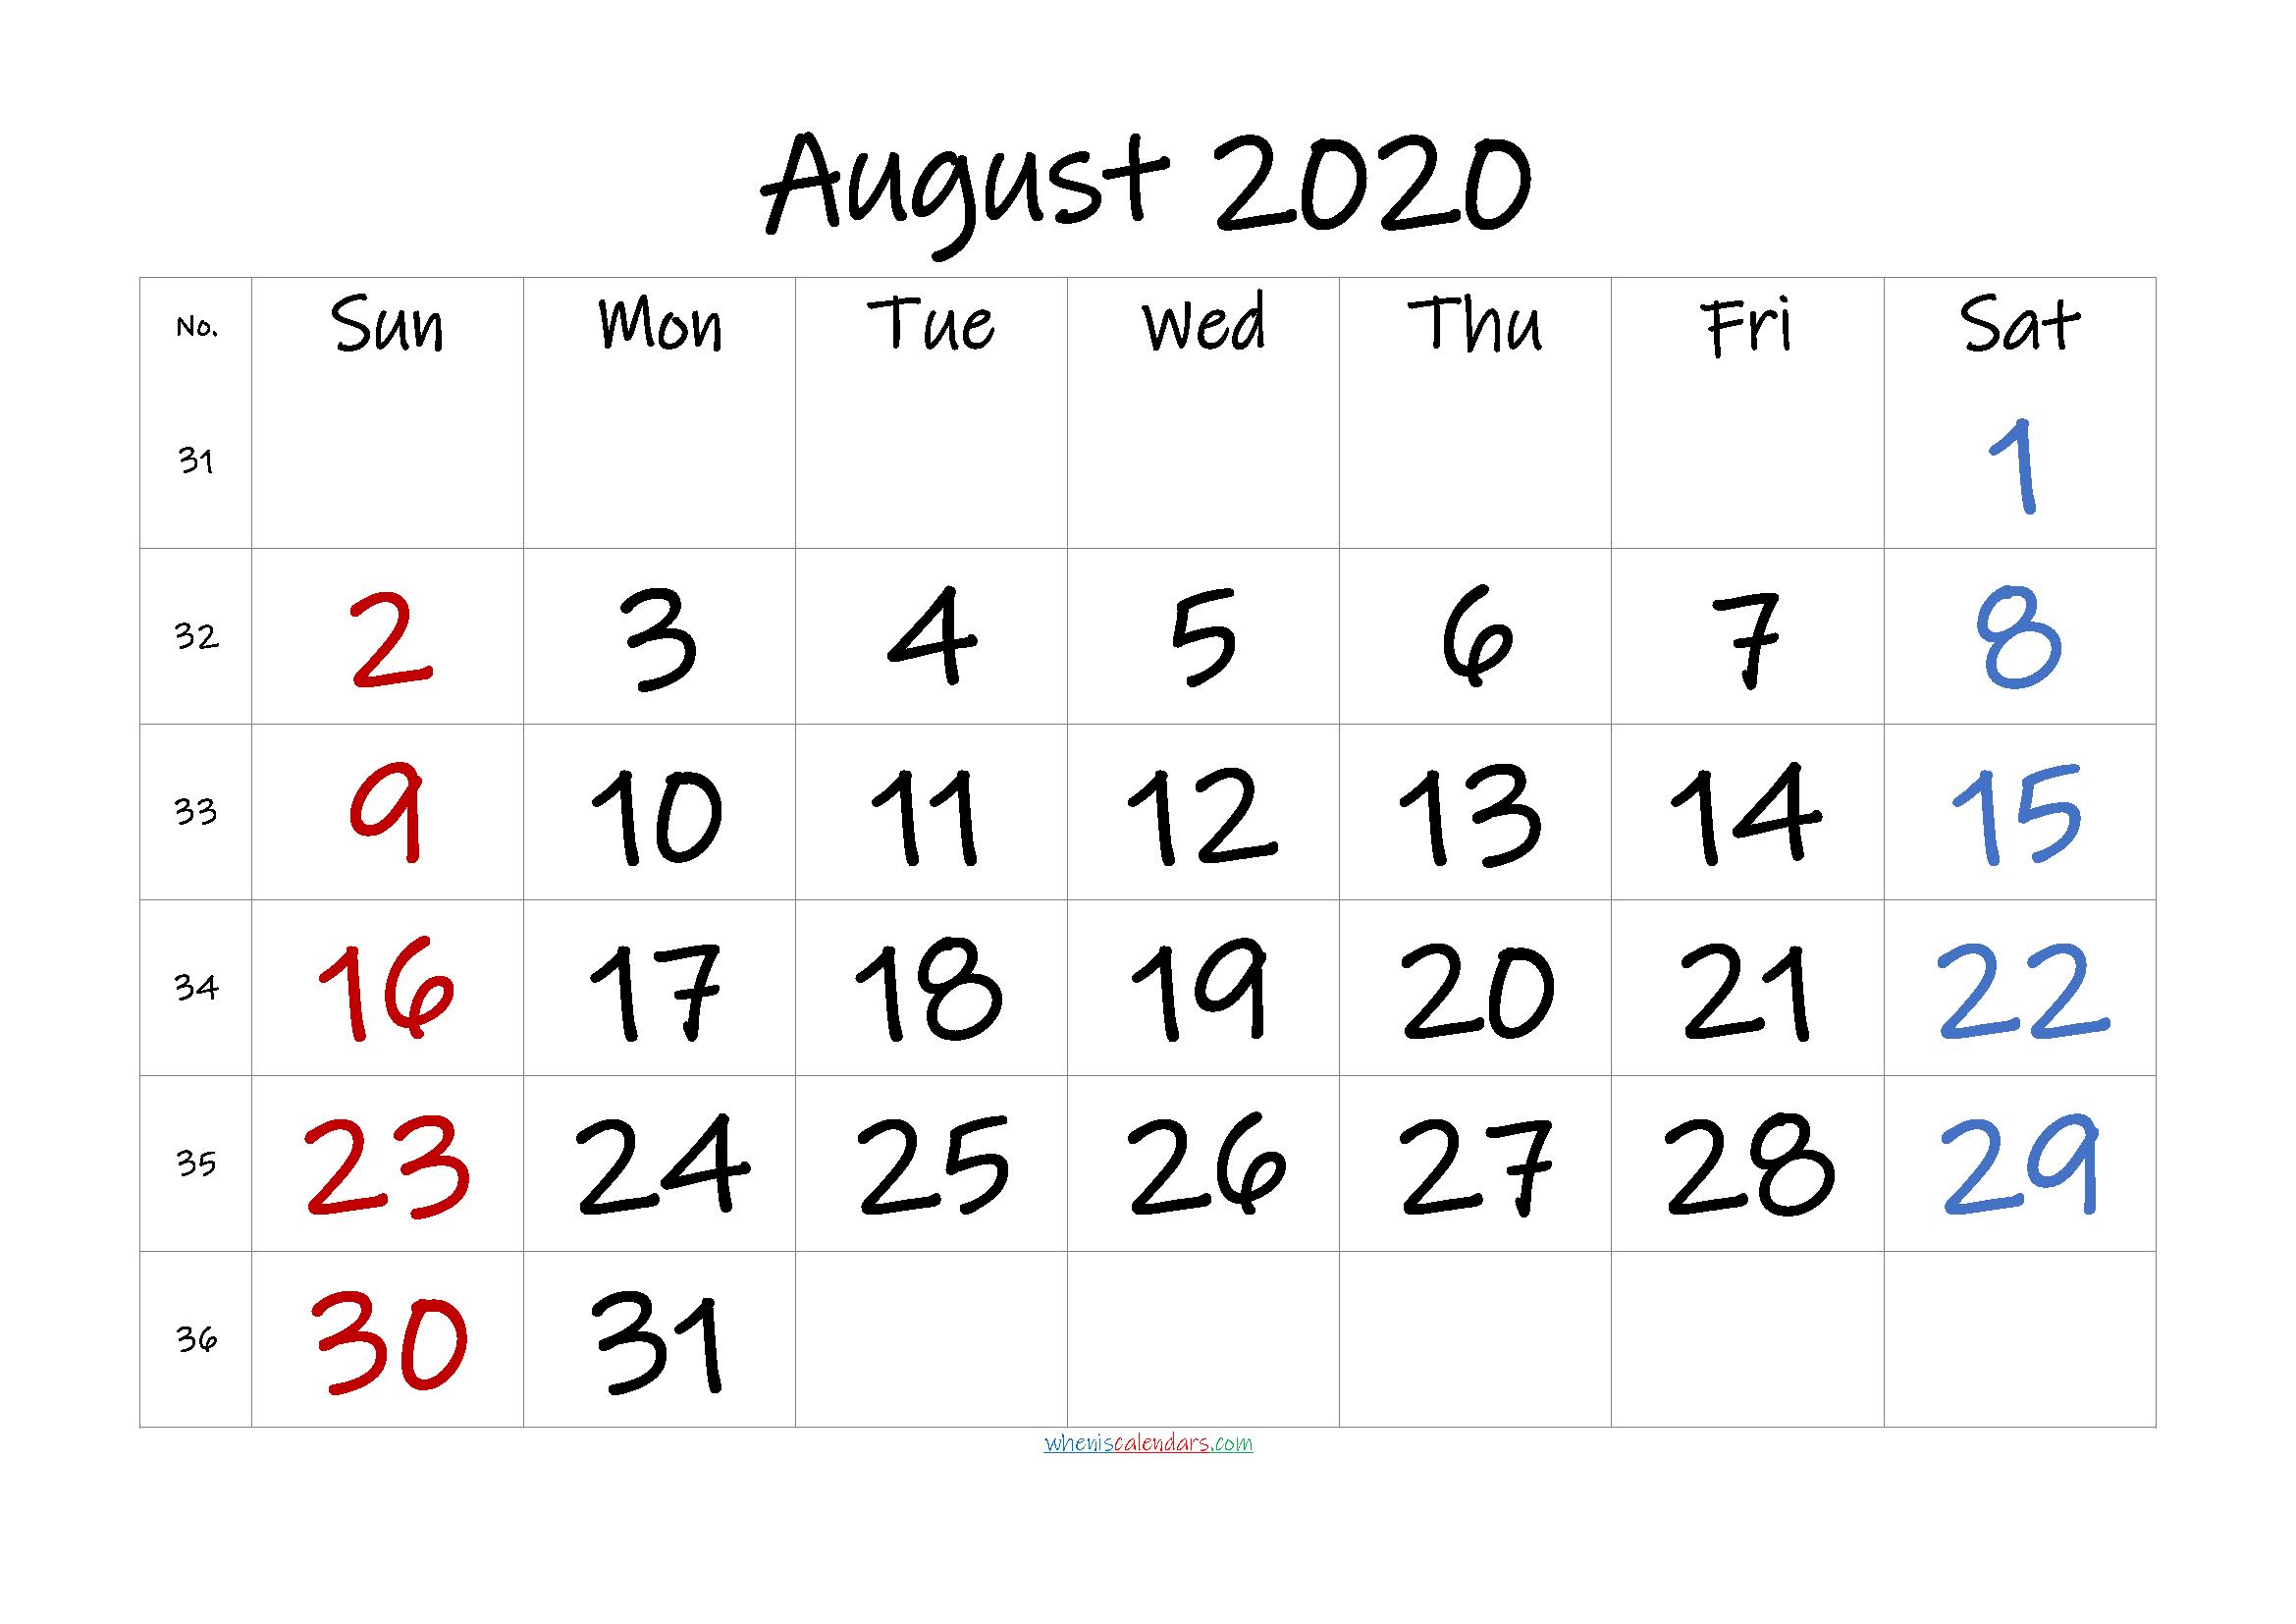 August 2020 Printable Calendar with Holidays